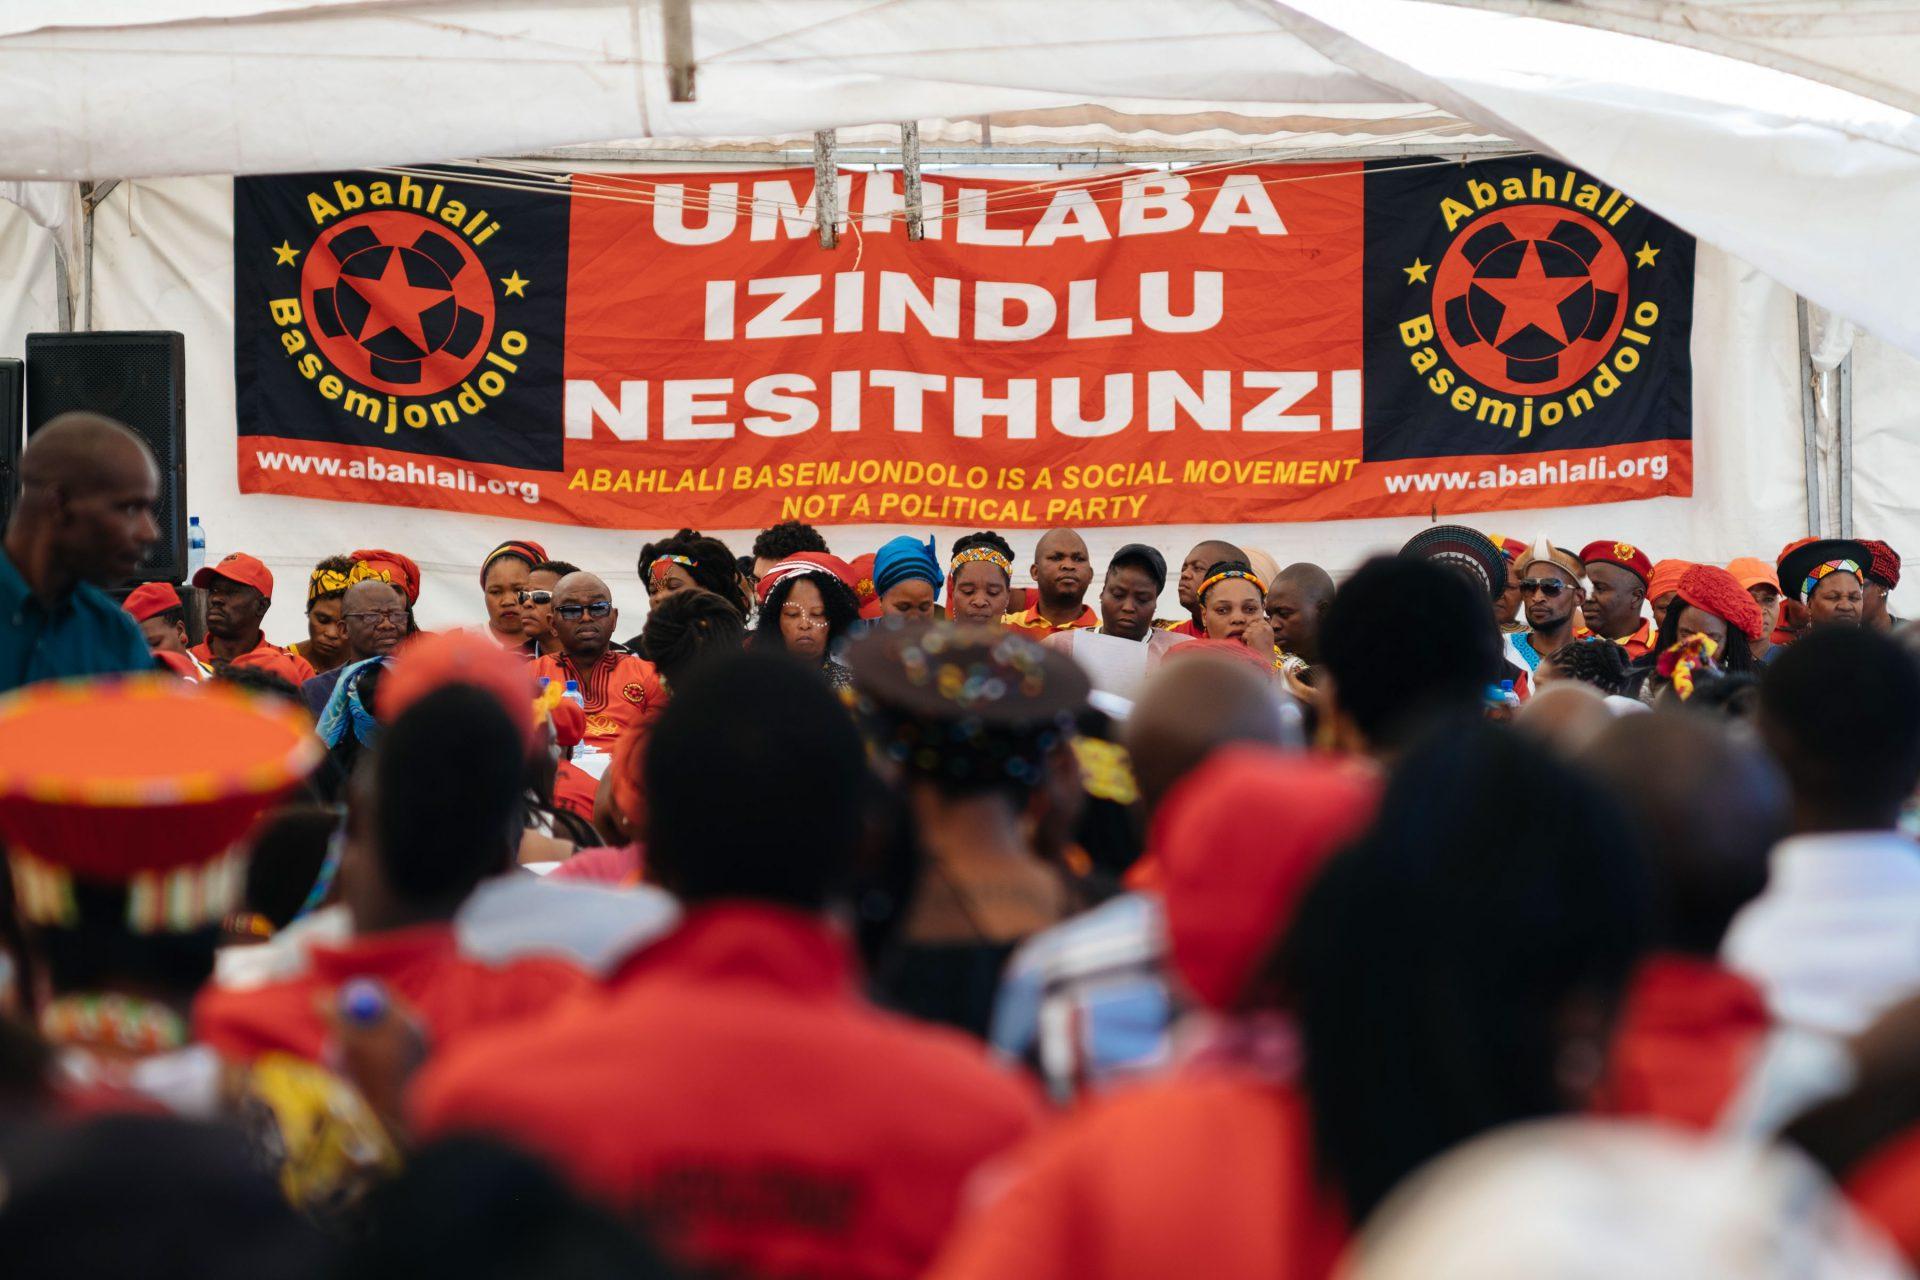 Abahlali baseMjondolo condemn xenophobia and violence